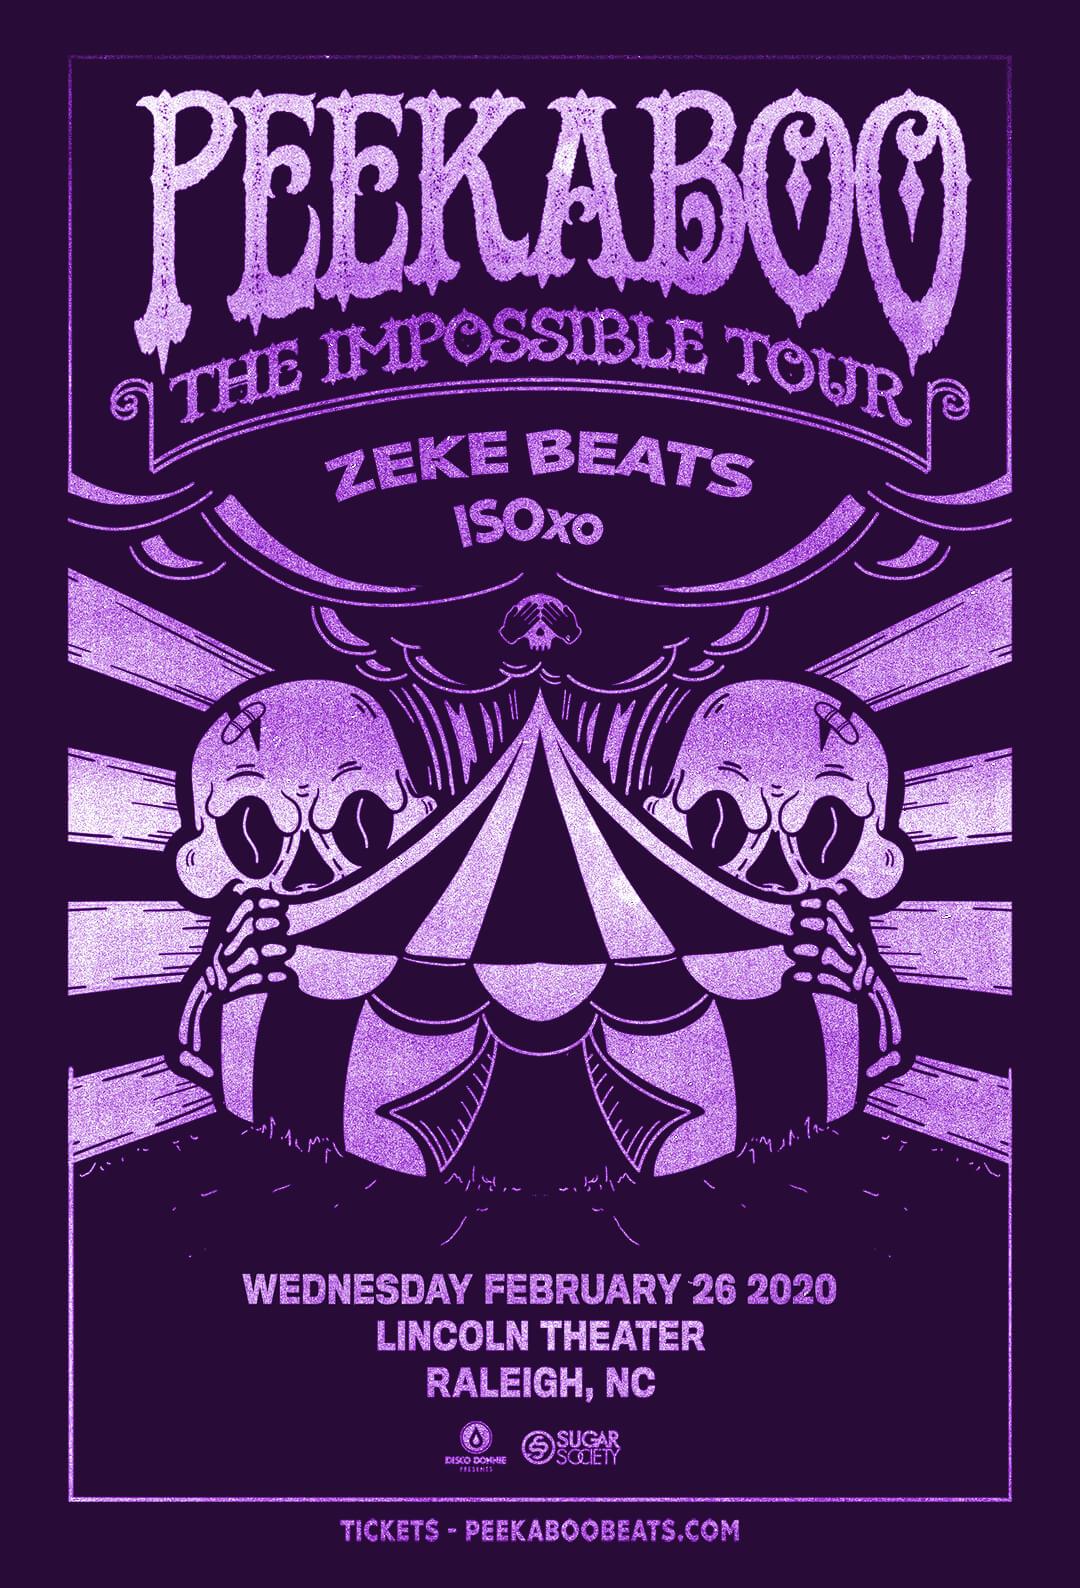 Peekaboo, Zeke Beats in Raleigh